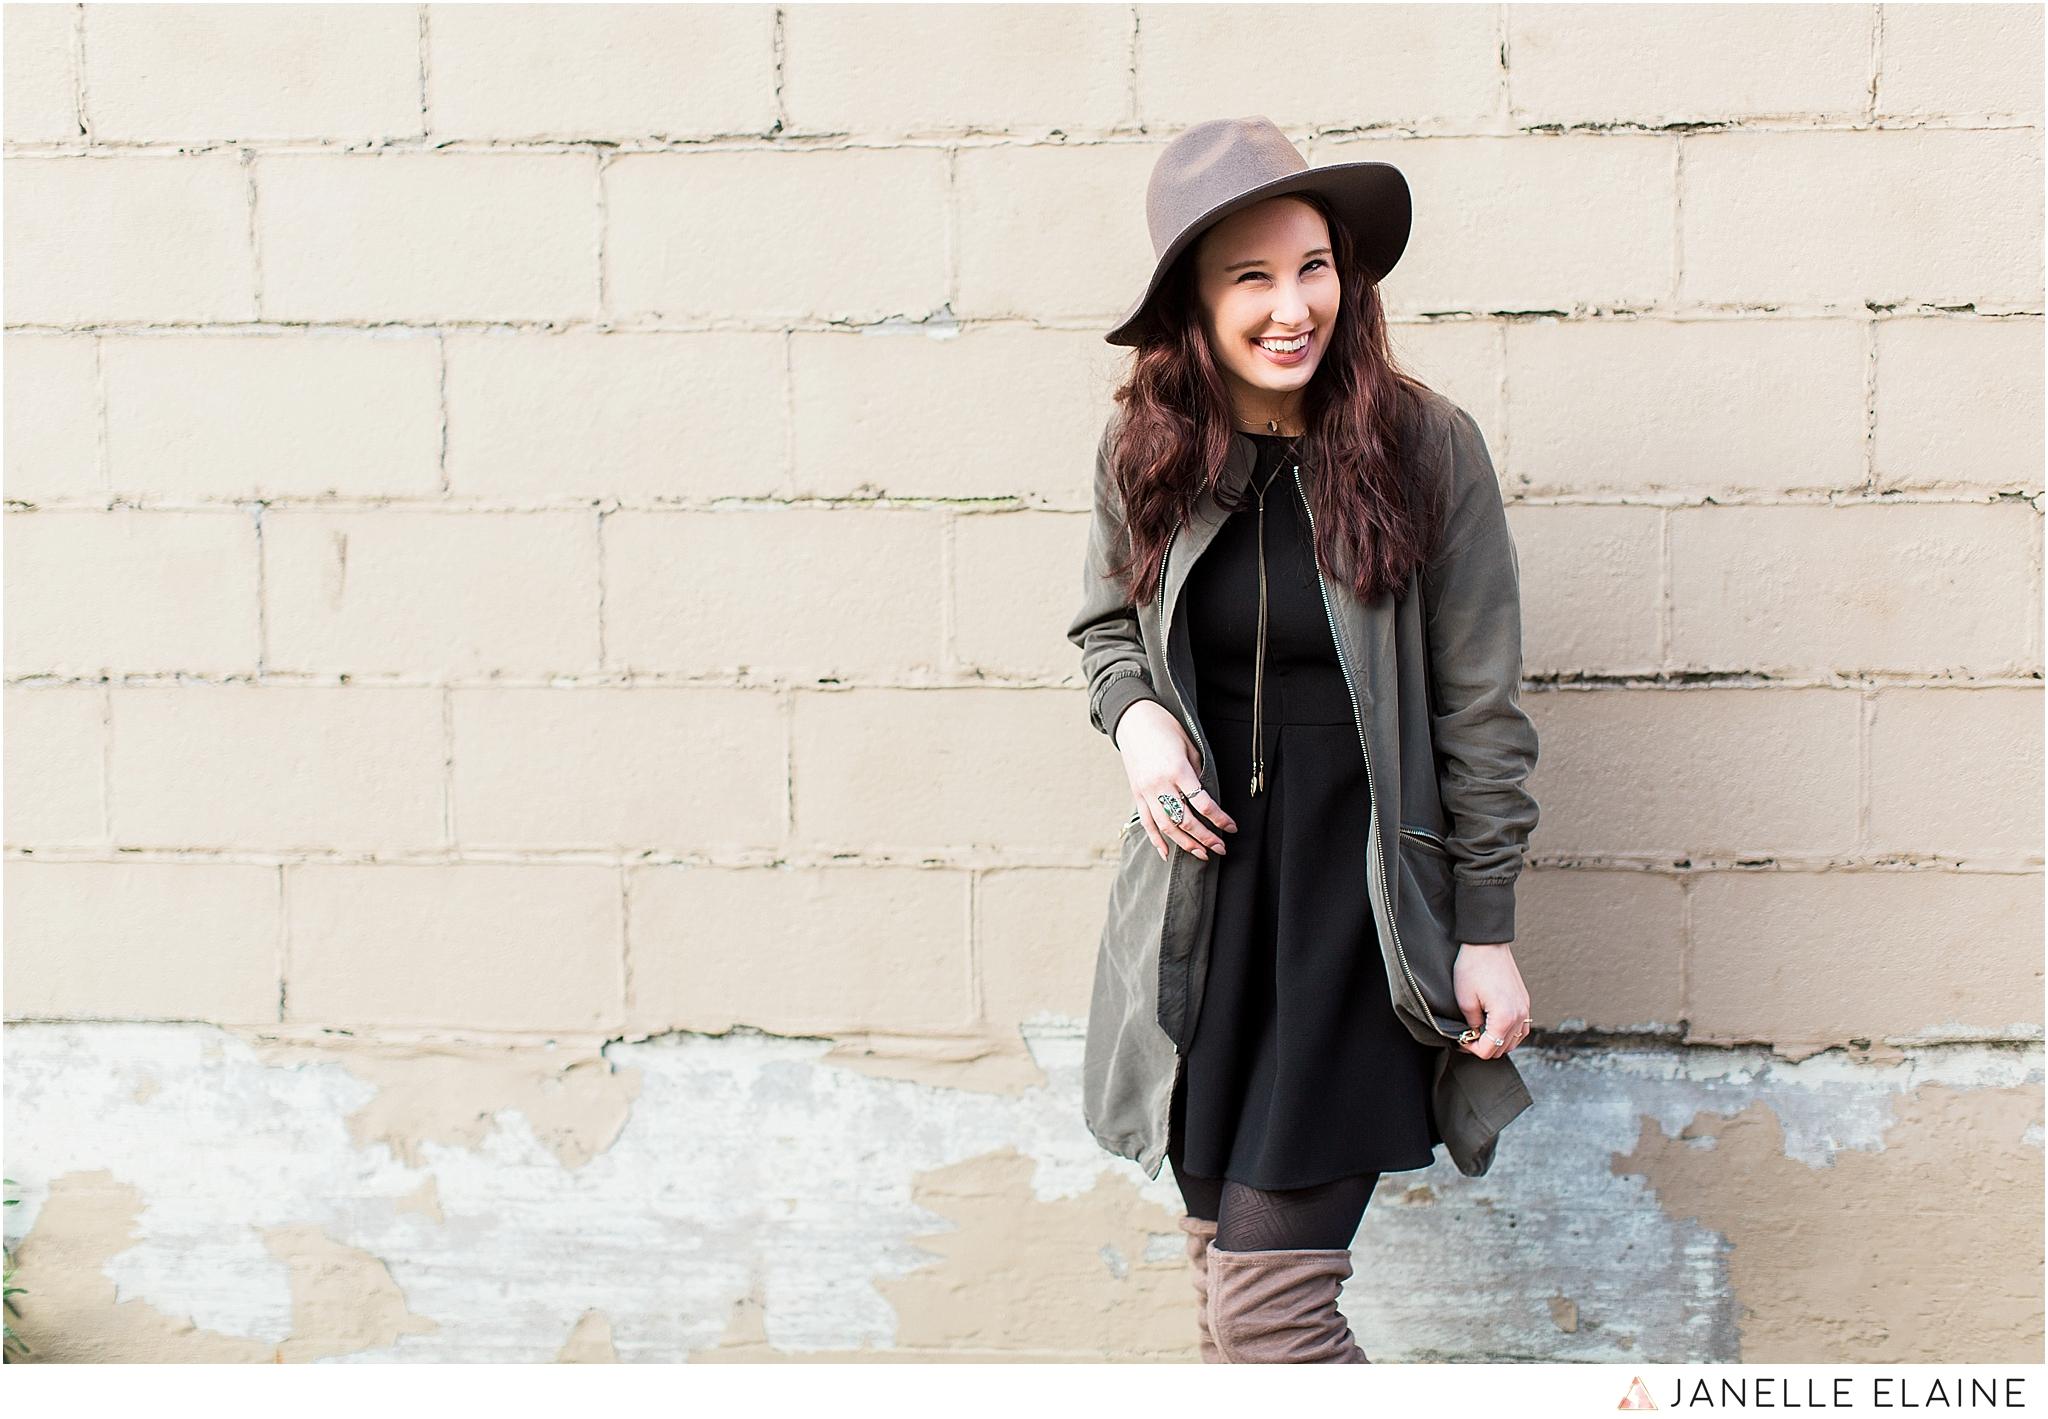 janelle elaine photography-seattle portrait photographer-washington-Hannah-19.jpg